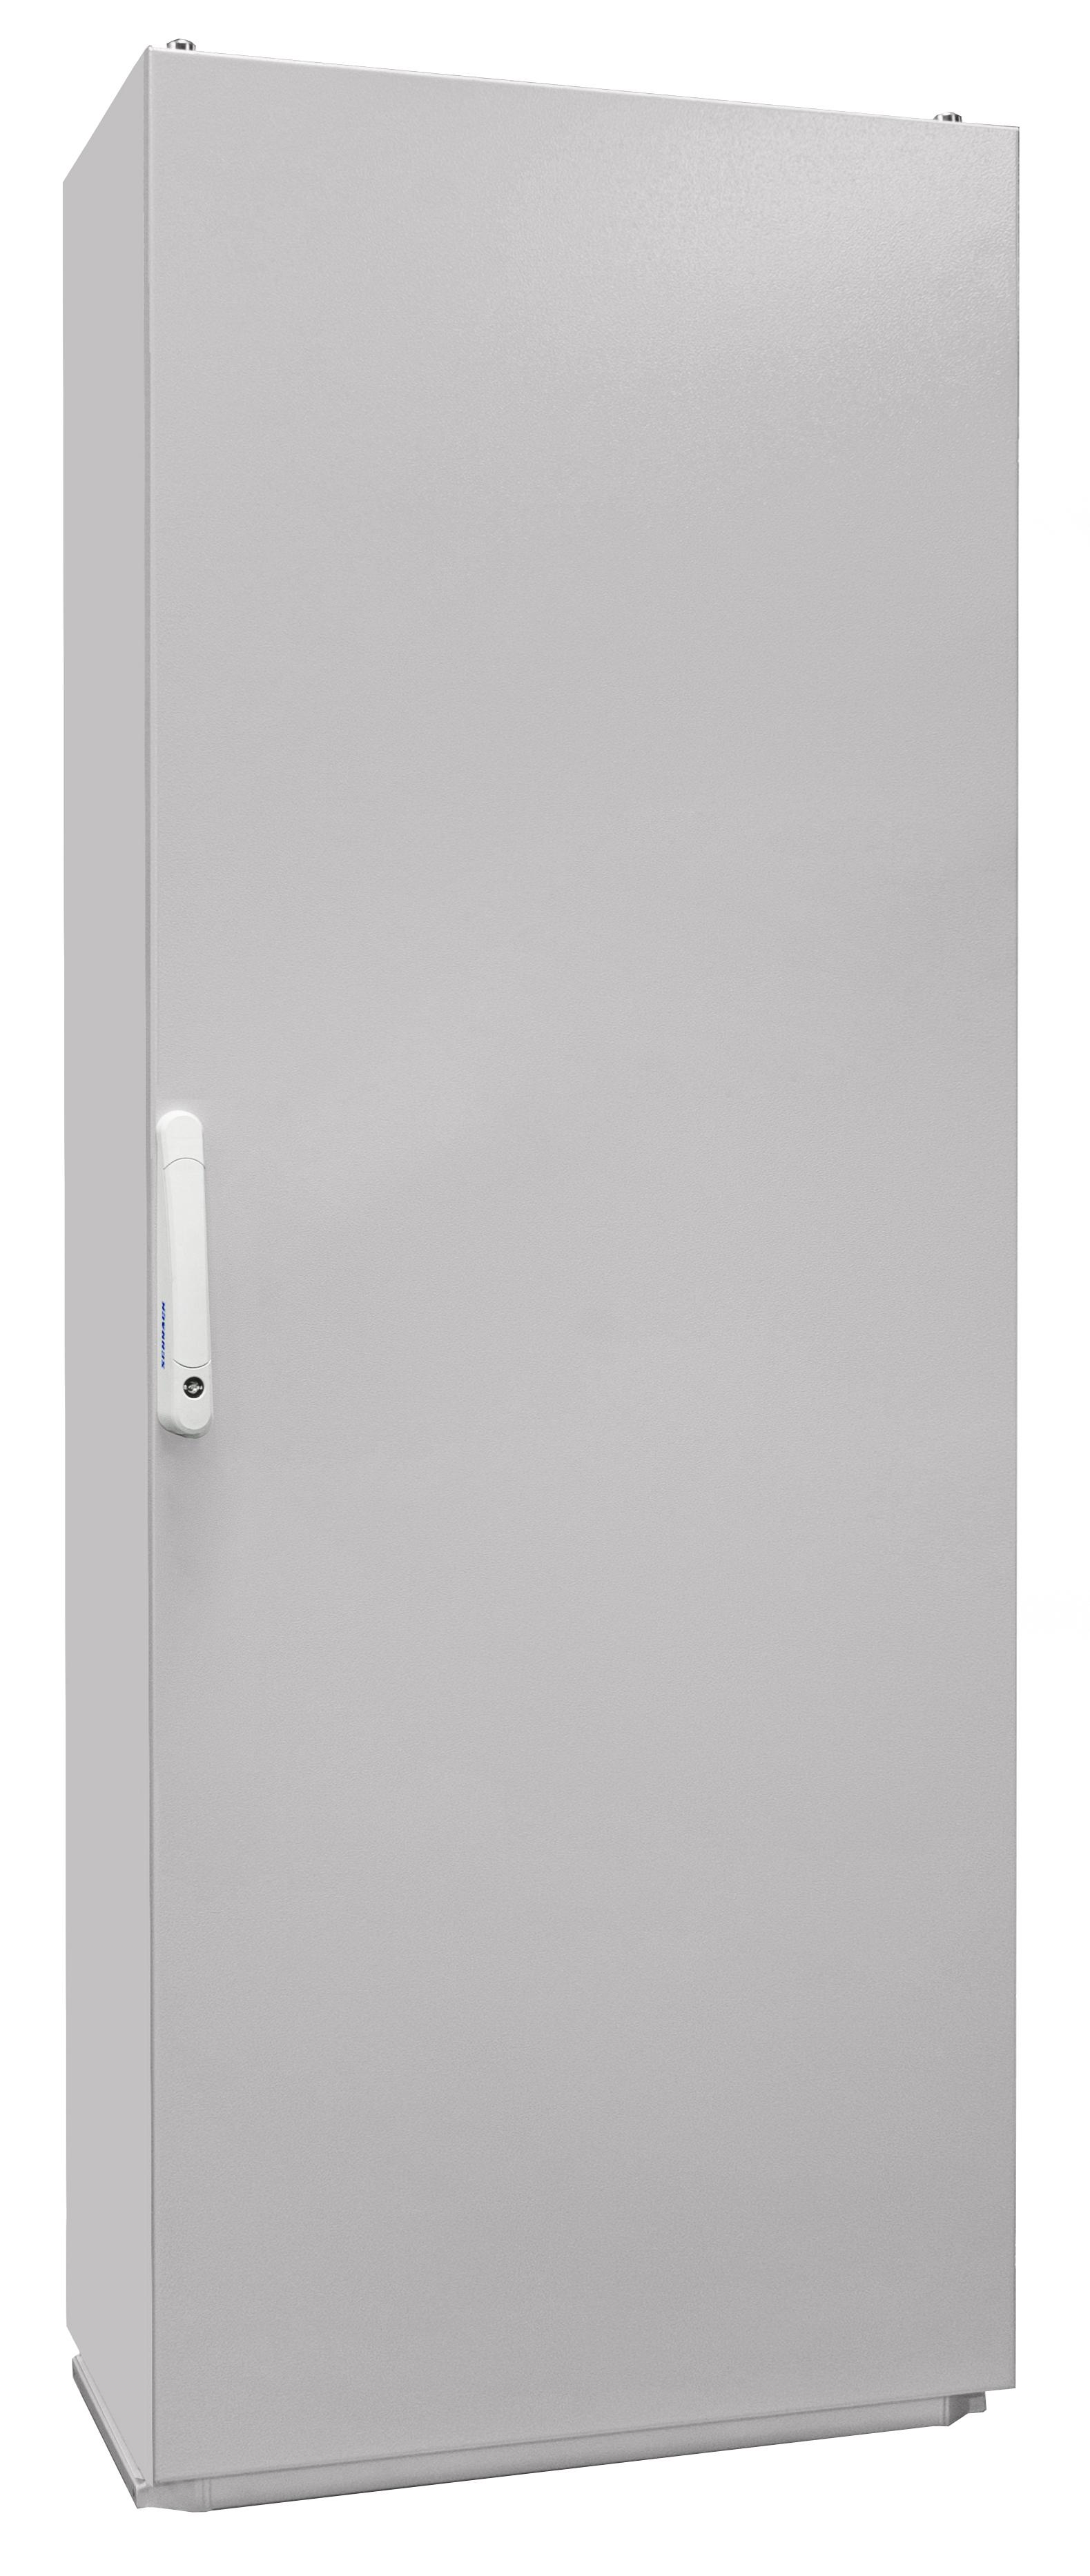 1 Stk Kompaktschrank 1-Tür IP55 H=2000 B=800 T=300mm Stahlblech KC208030--